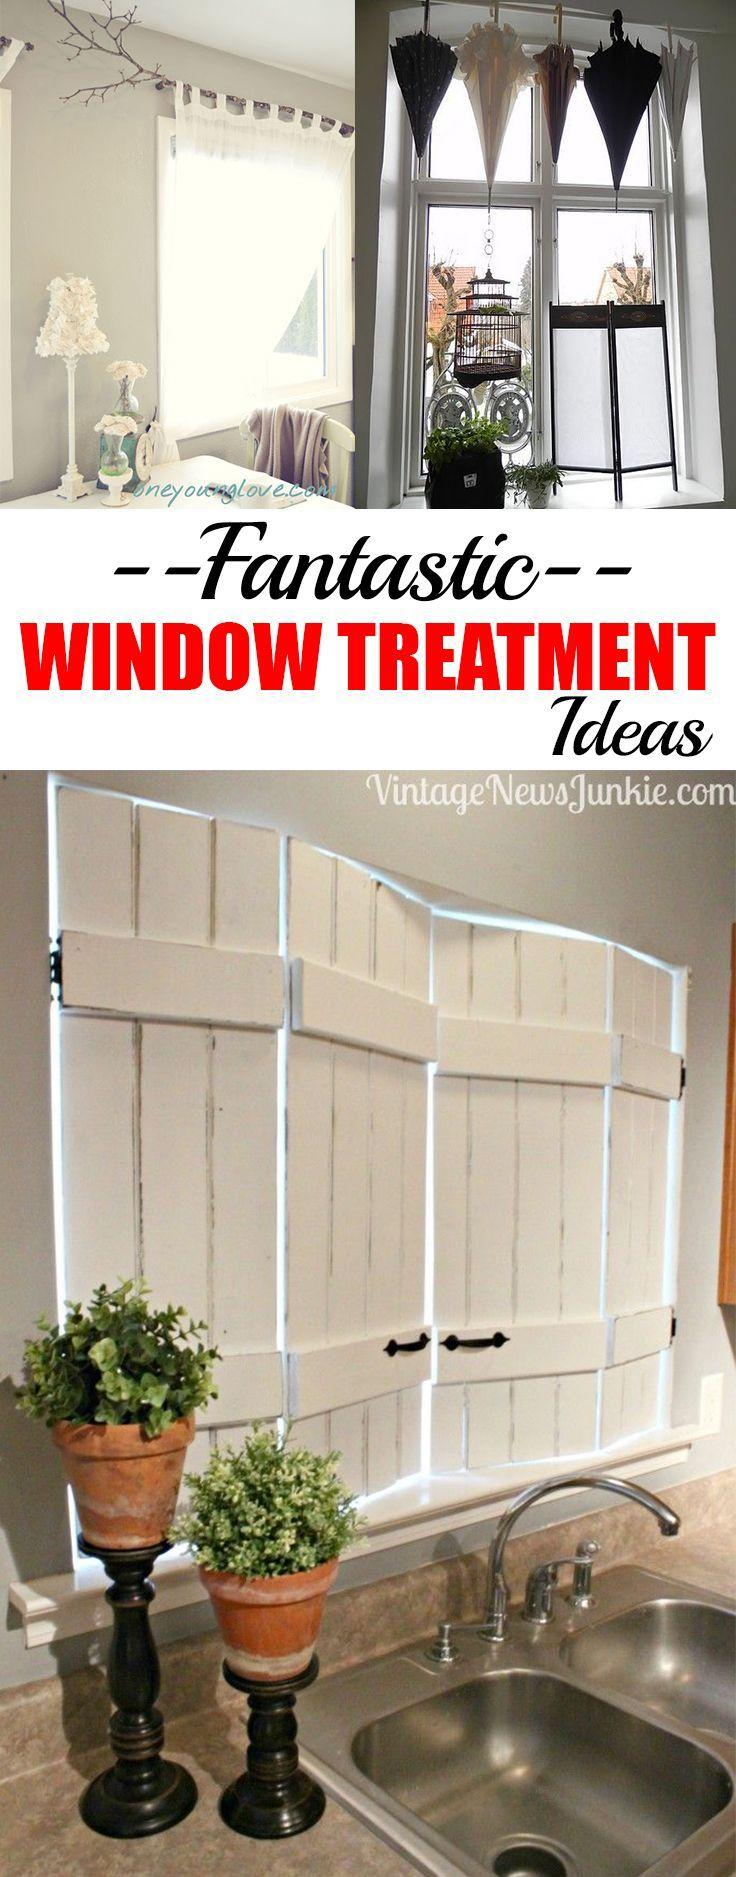 25 Fantastically Retro And Vintage Home Decorations: Best 25+ Unique Window Treatments Ideas On Pinterest